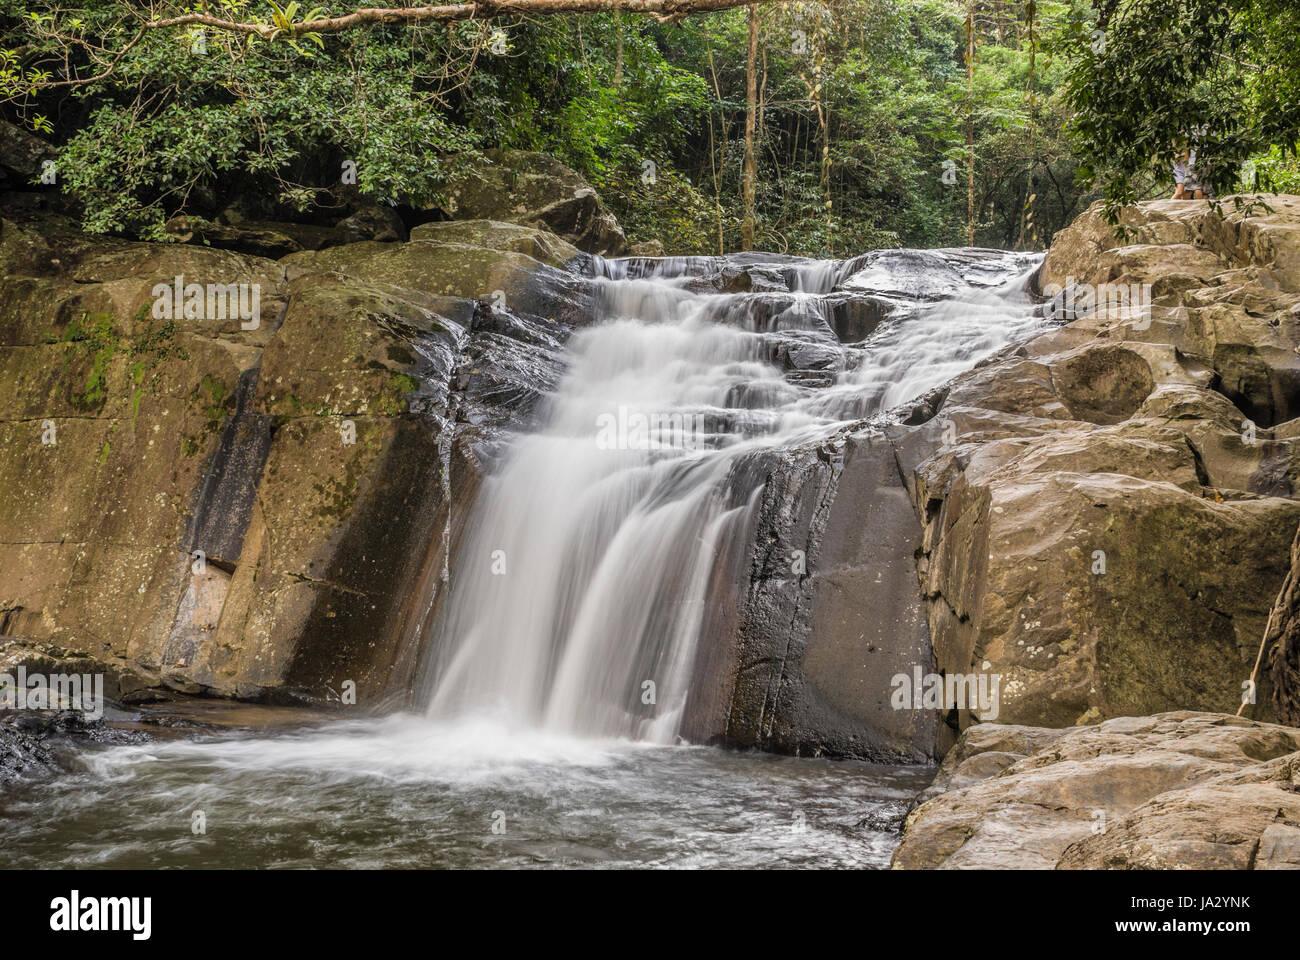 Cascada pala-U, Parque Nacional Kaeng Krachan, Tailandia Foto de stock